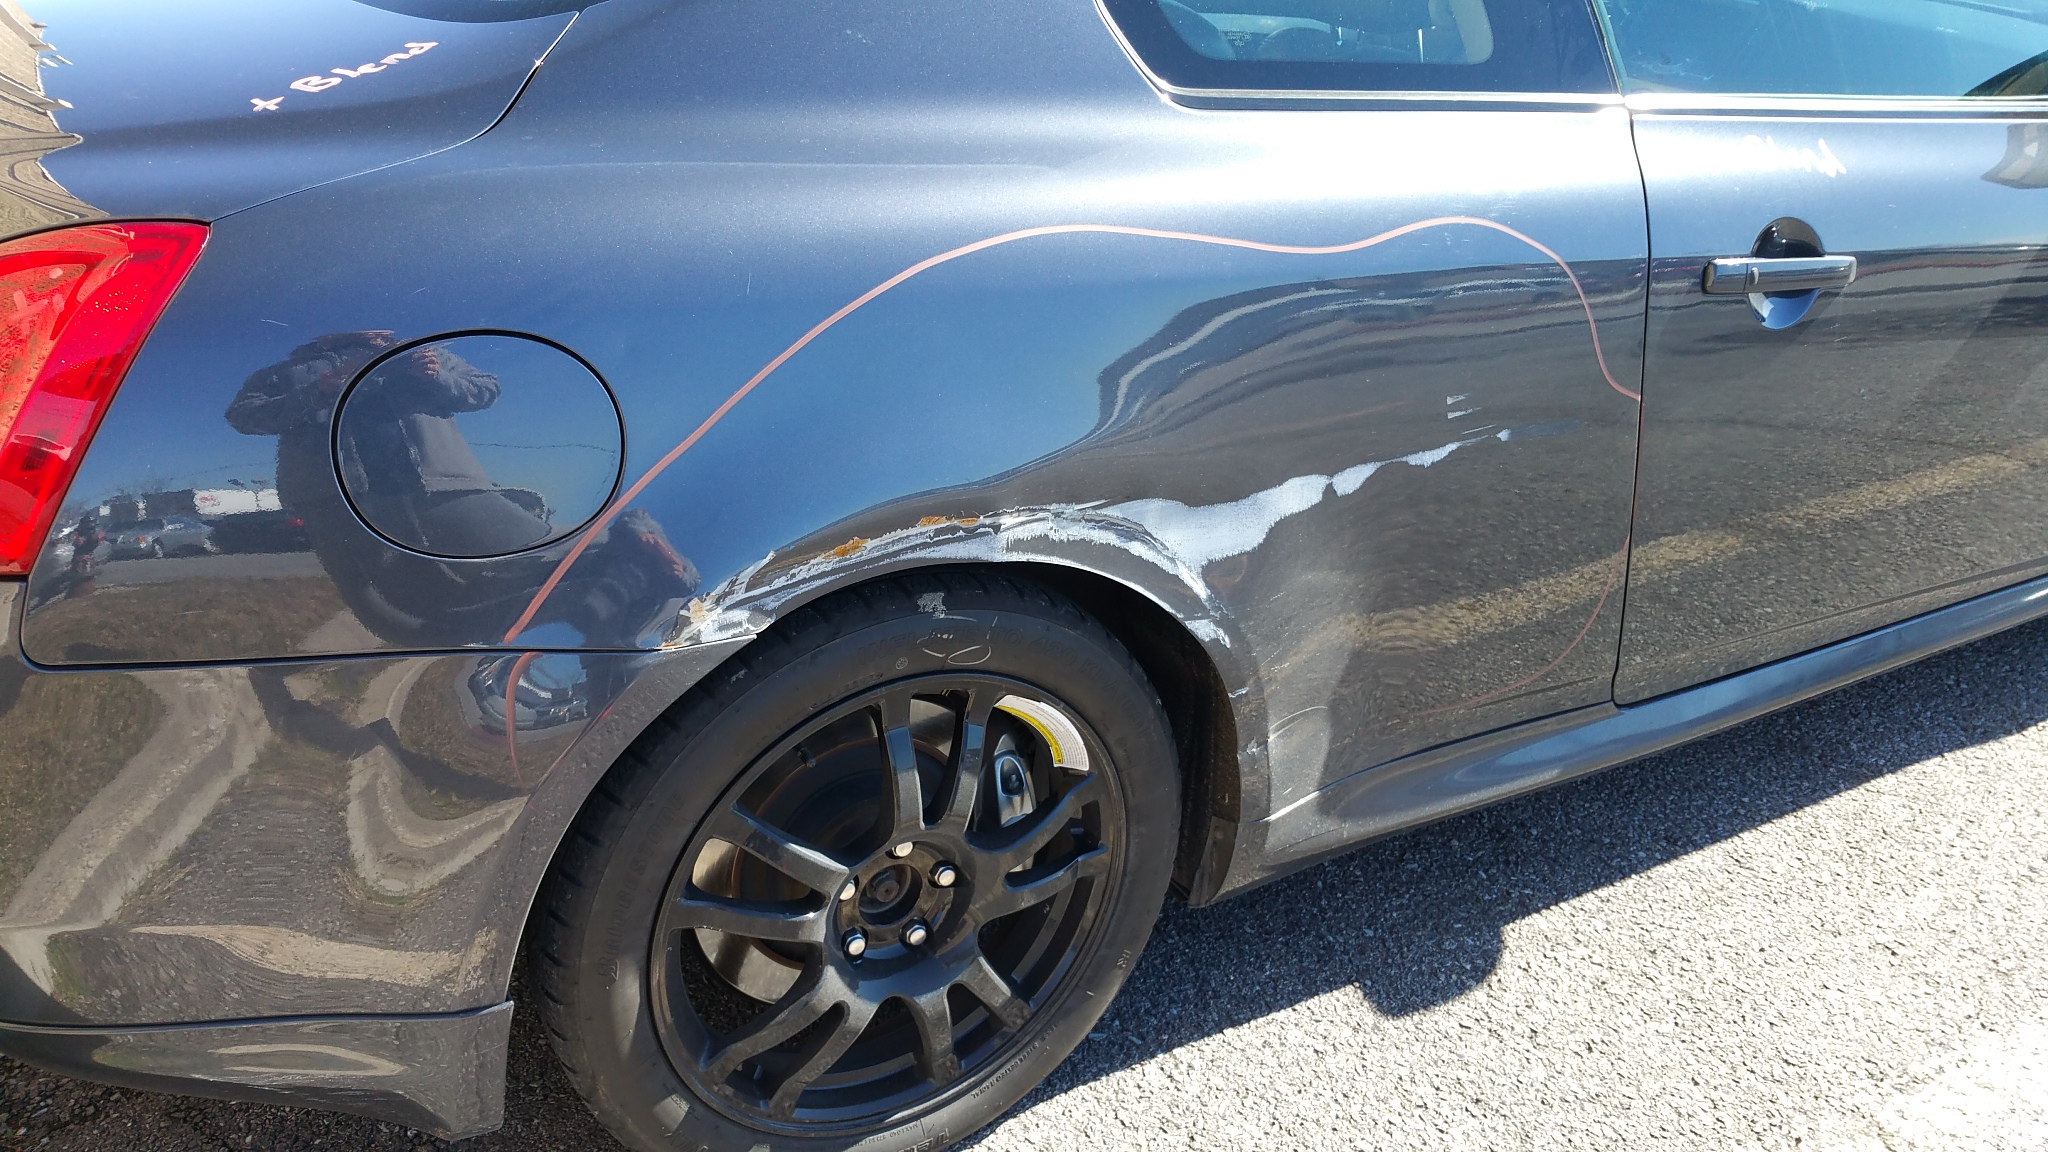 2009 Infinti G37s - Side damage